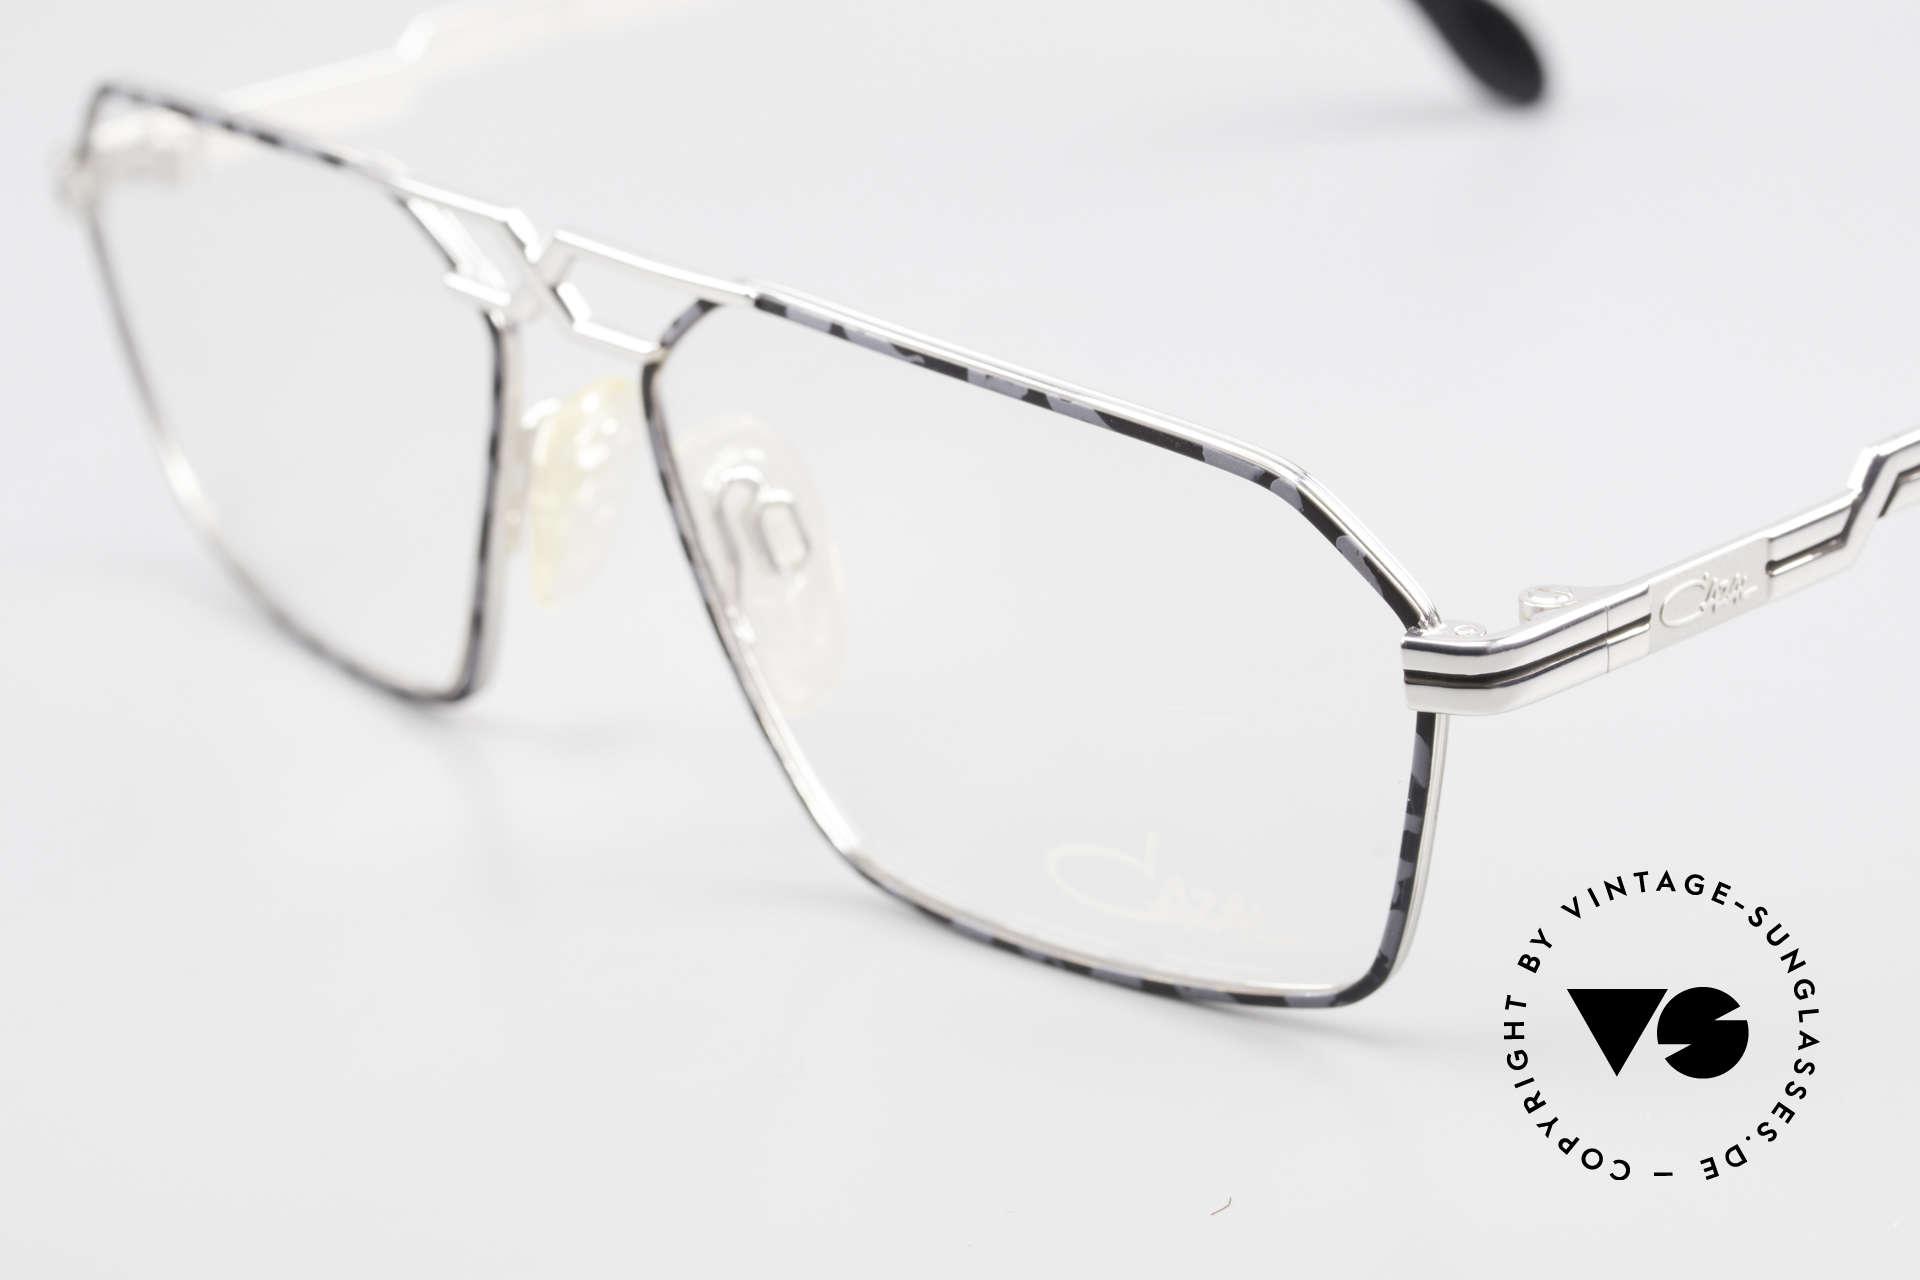 Cazal 744 90's Vintage Glasses For Men, new old stock (like all our vintage CAZAL specs), Made for Men